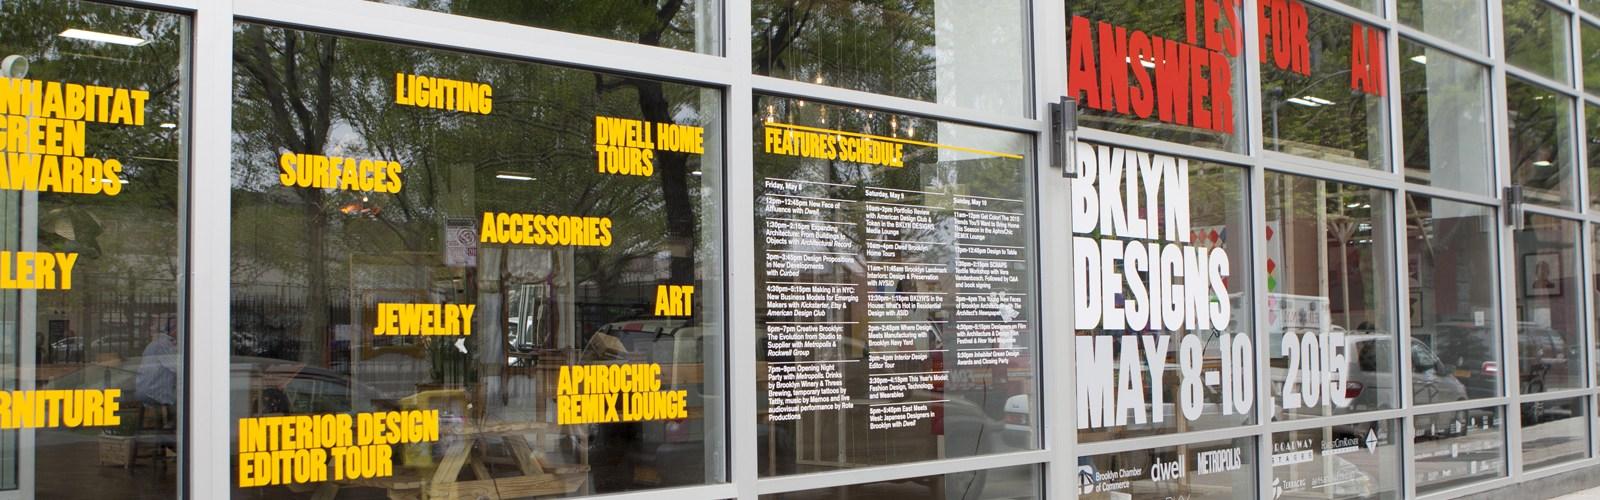 Design, Brooklyn, New York Design Week